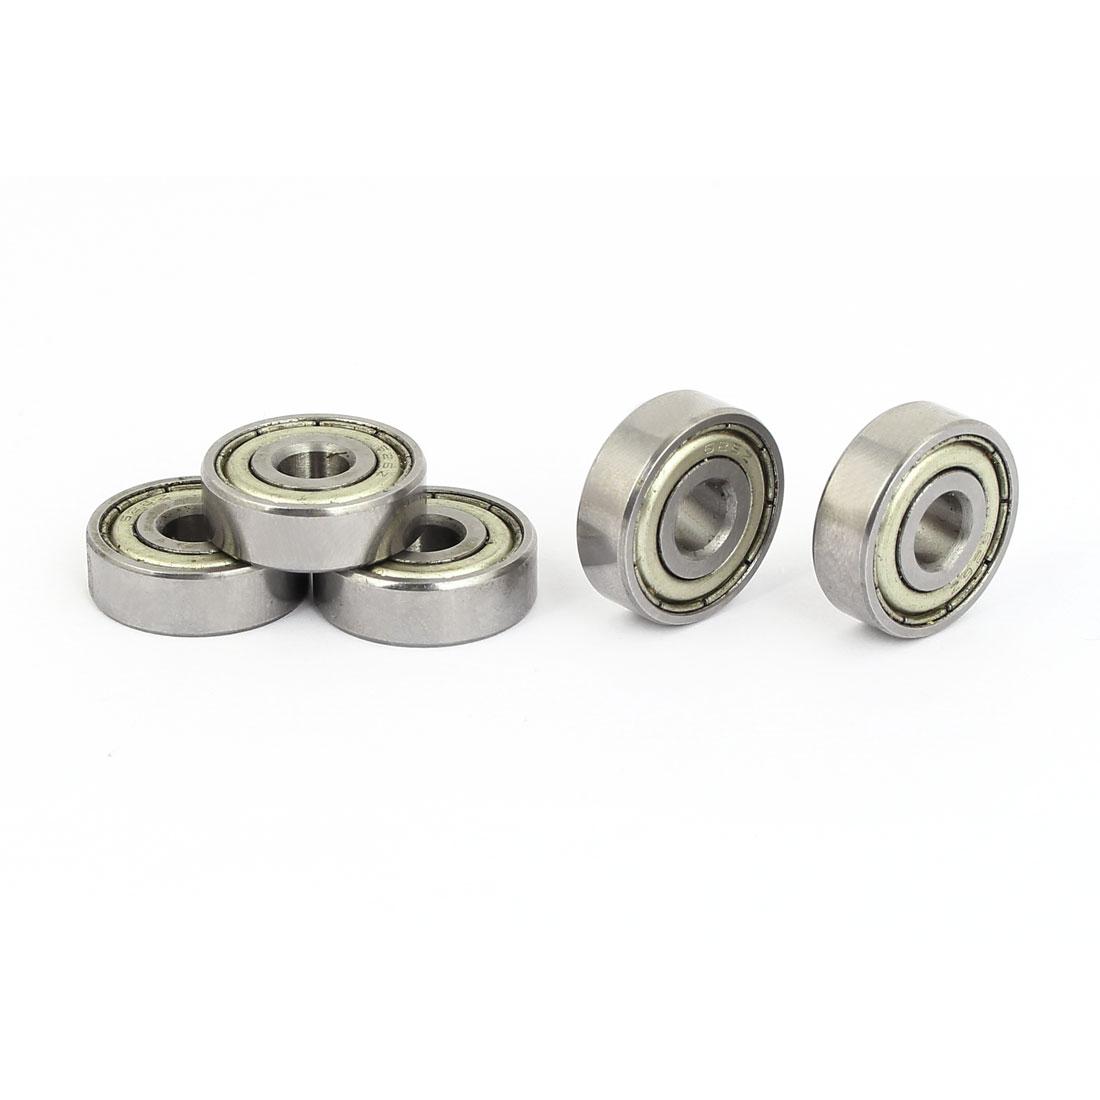 6mm x 19mm x 6mm Double Shielded Single Row Deep Groove Ball Bearings 5PCS